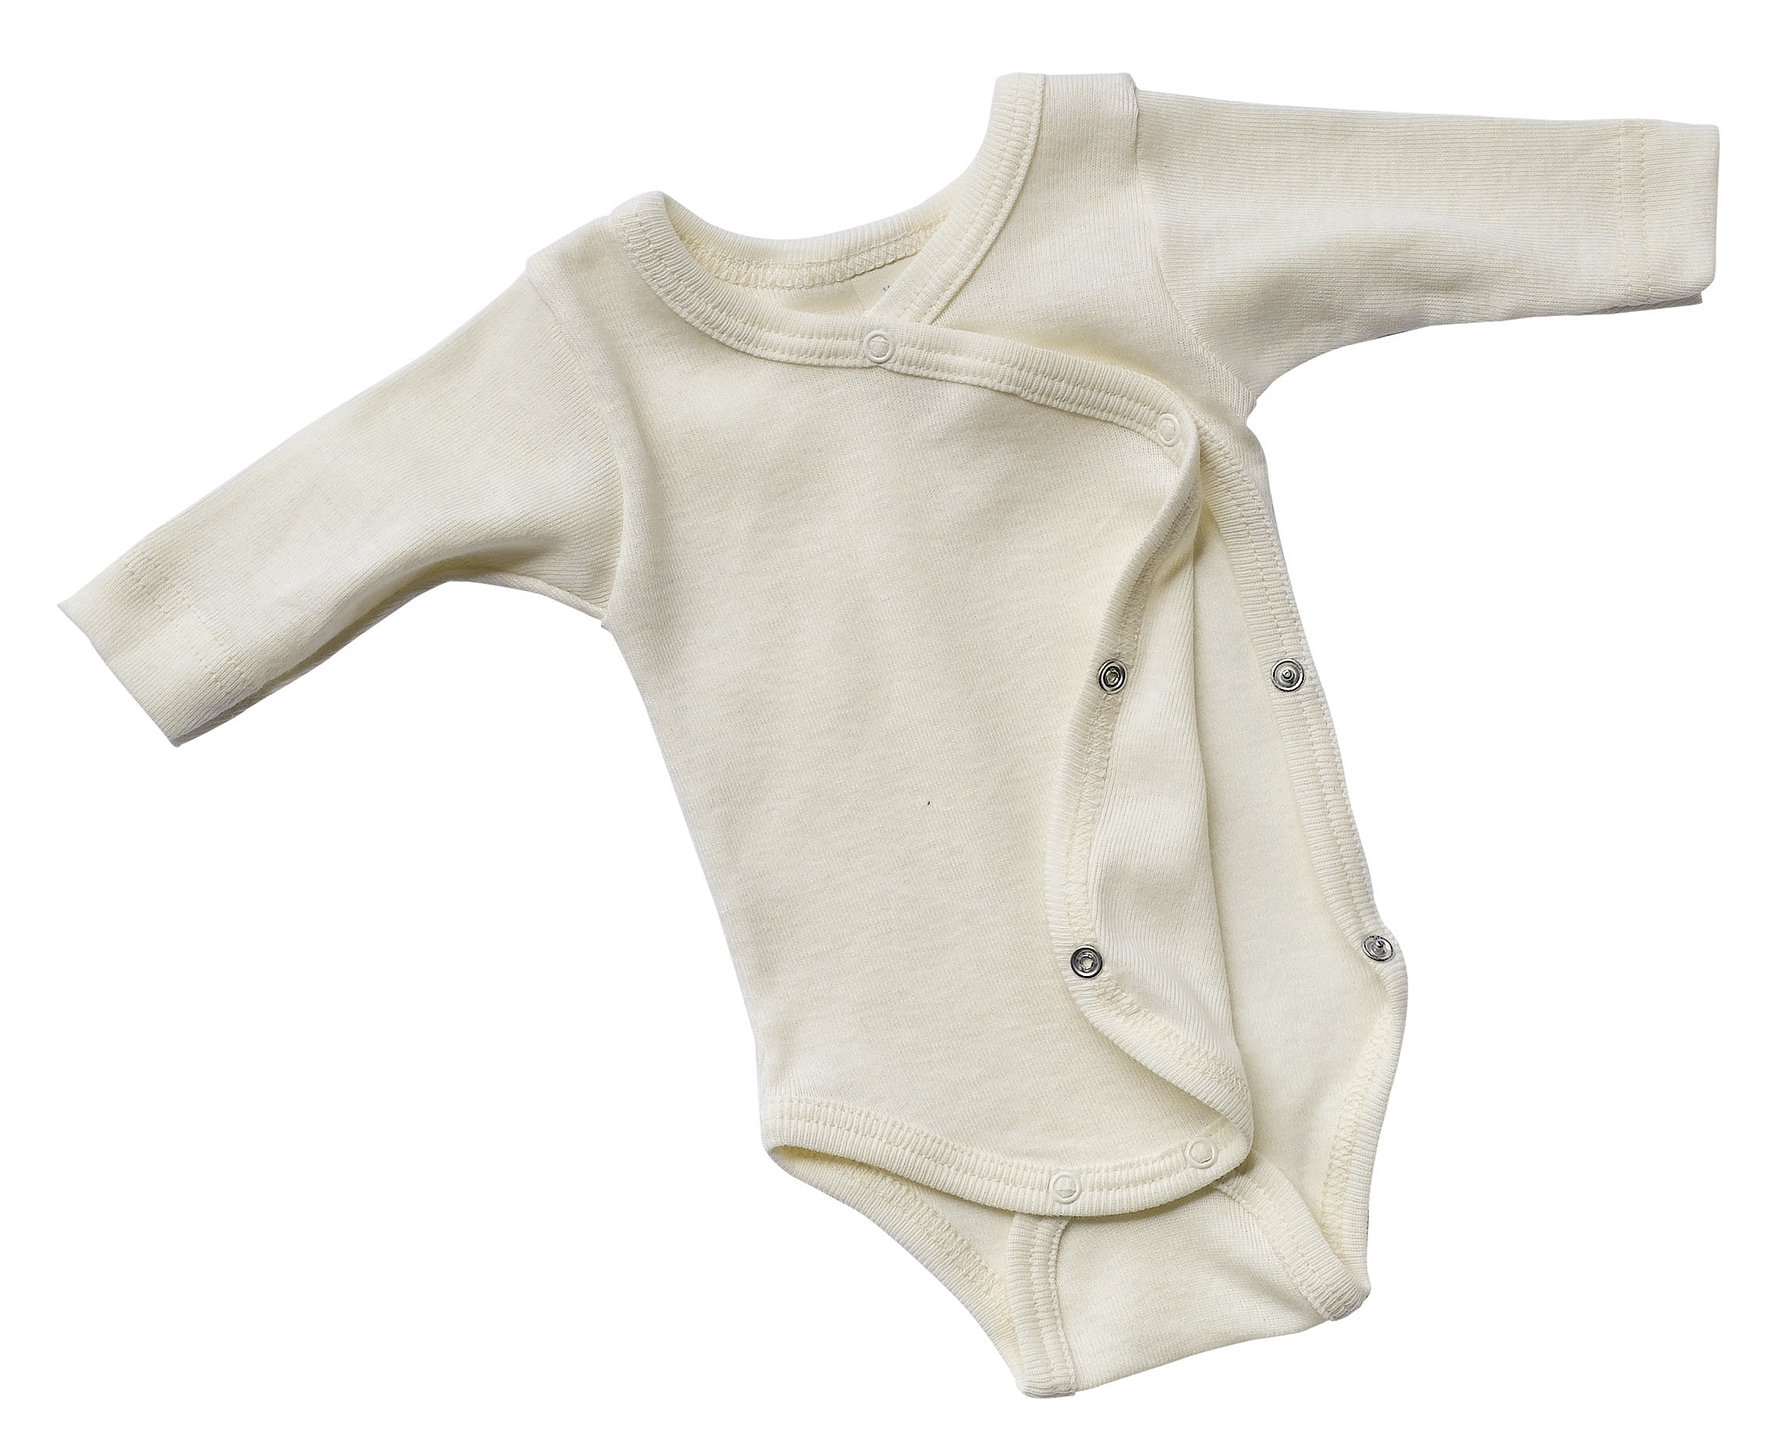 Lana de seda baby body con bot/ón de presi/ón/-/woll body de /ángel walnuss//natur 110 Engel Axil